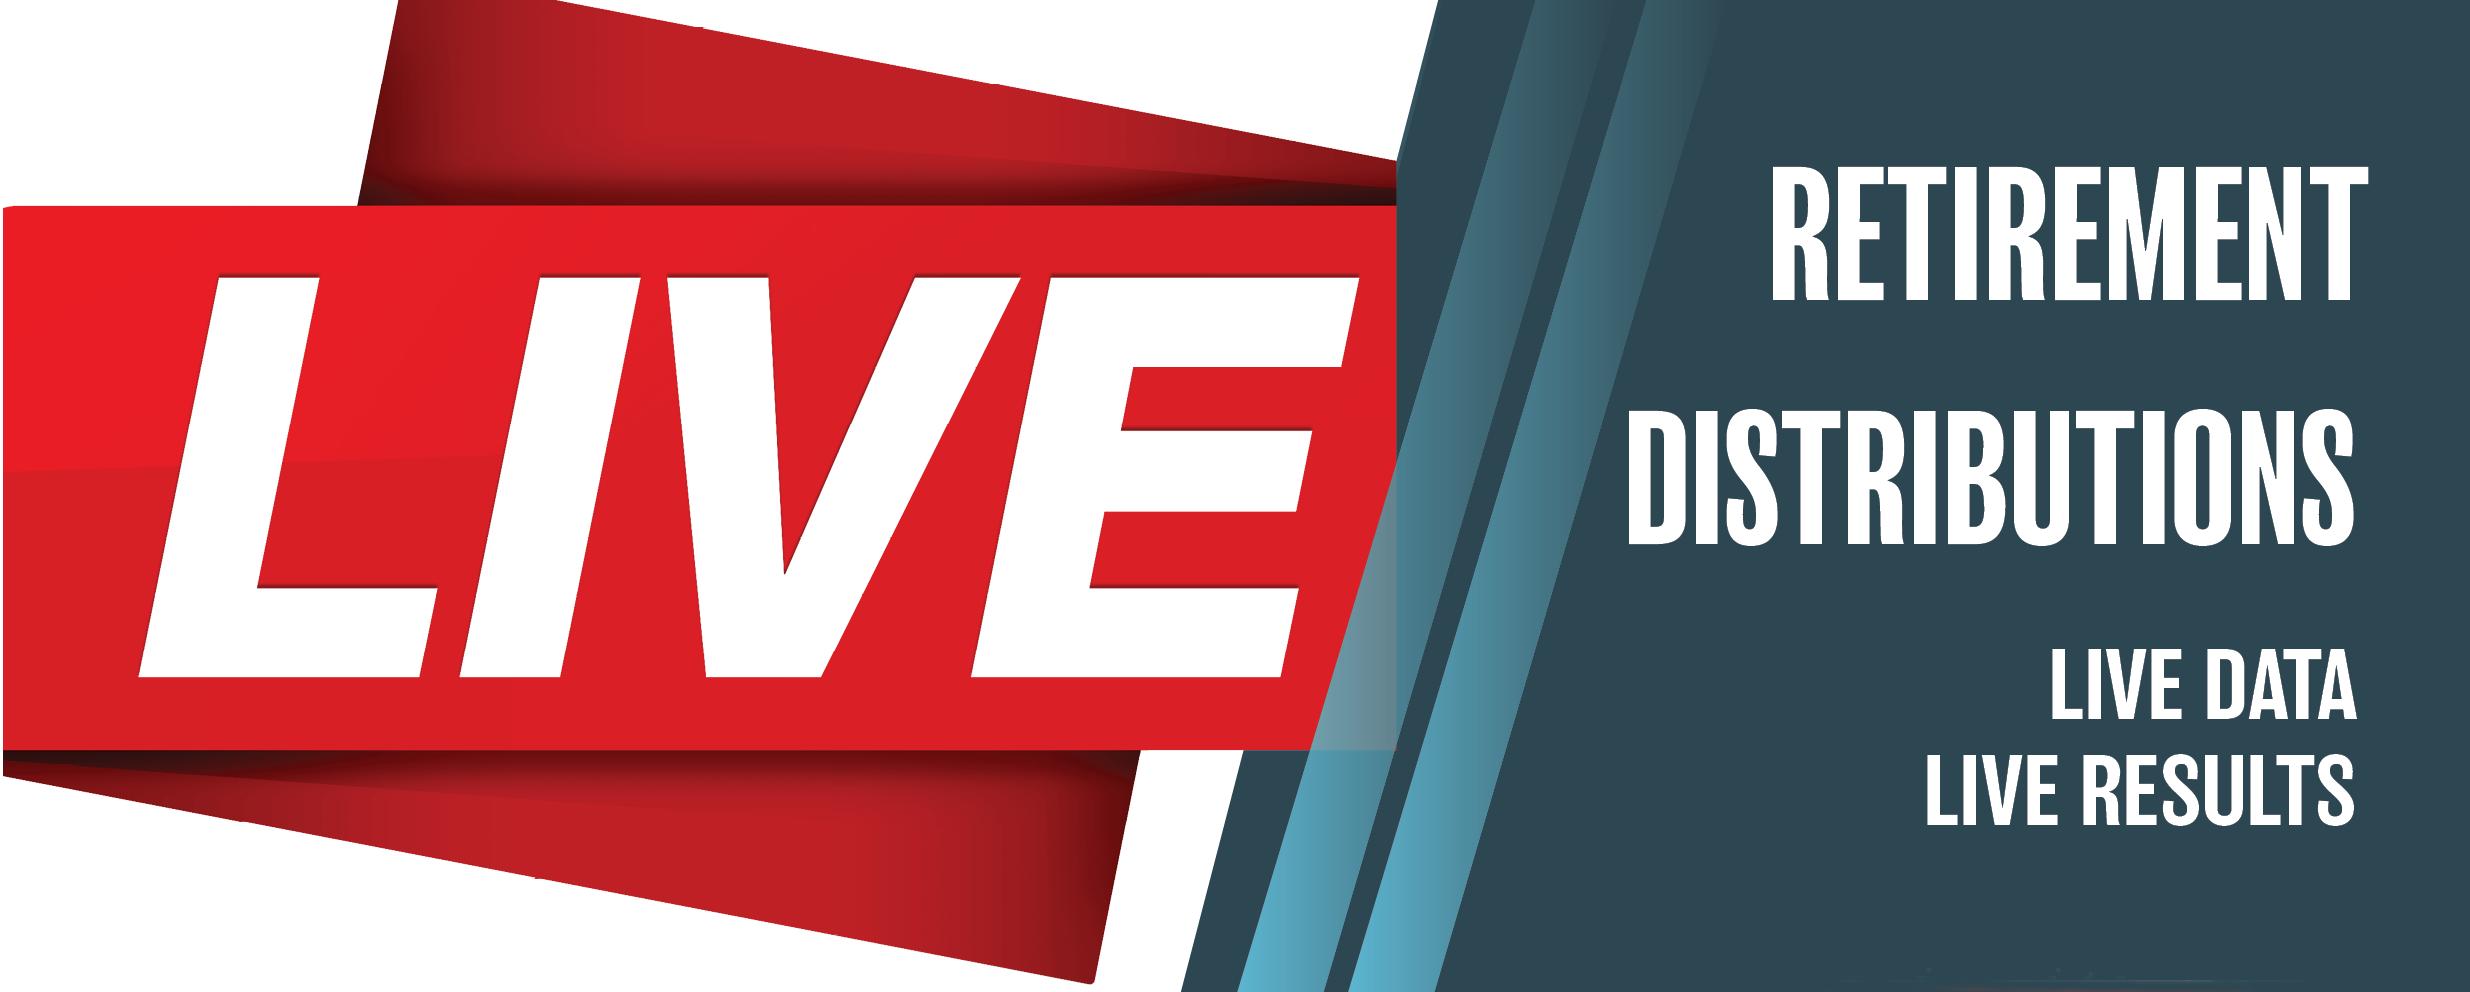 Retirement Distributions LIVE | LIVE DATA | LIVE RESULTS